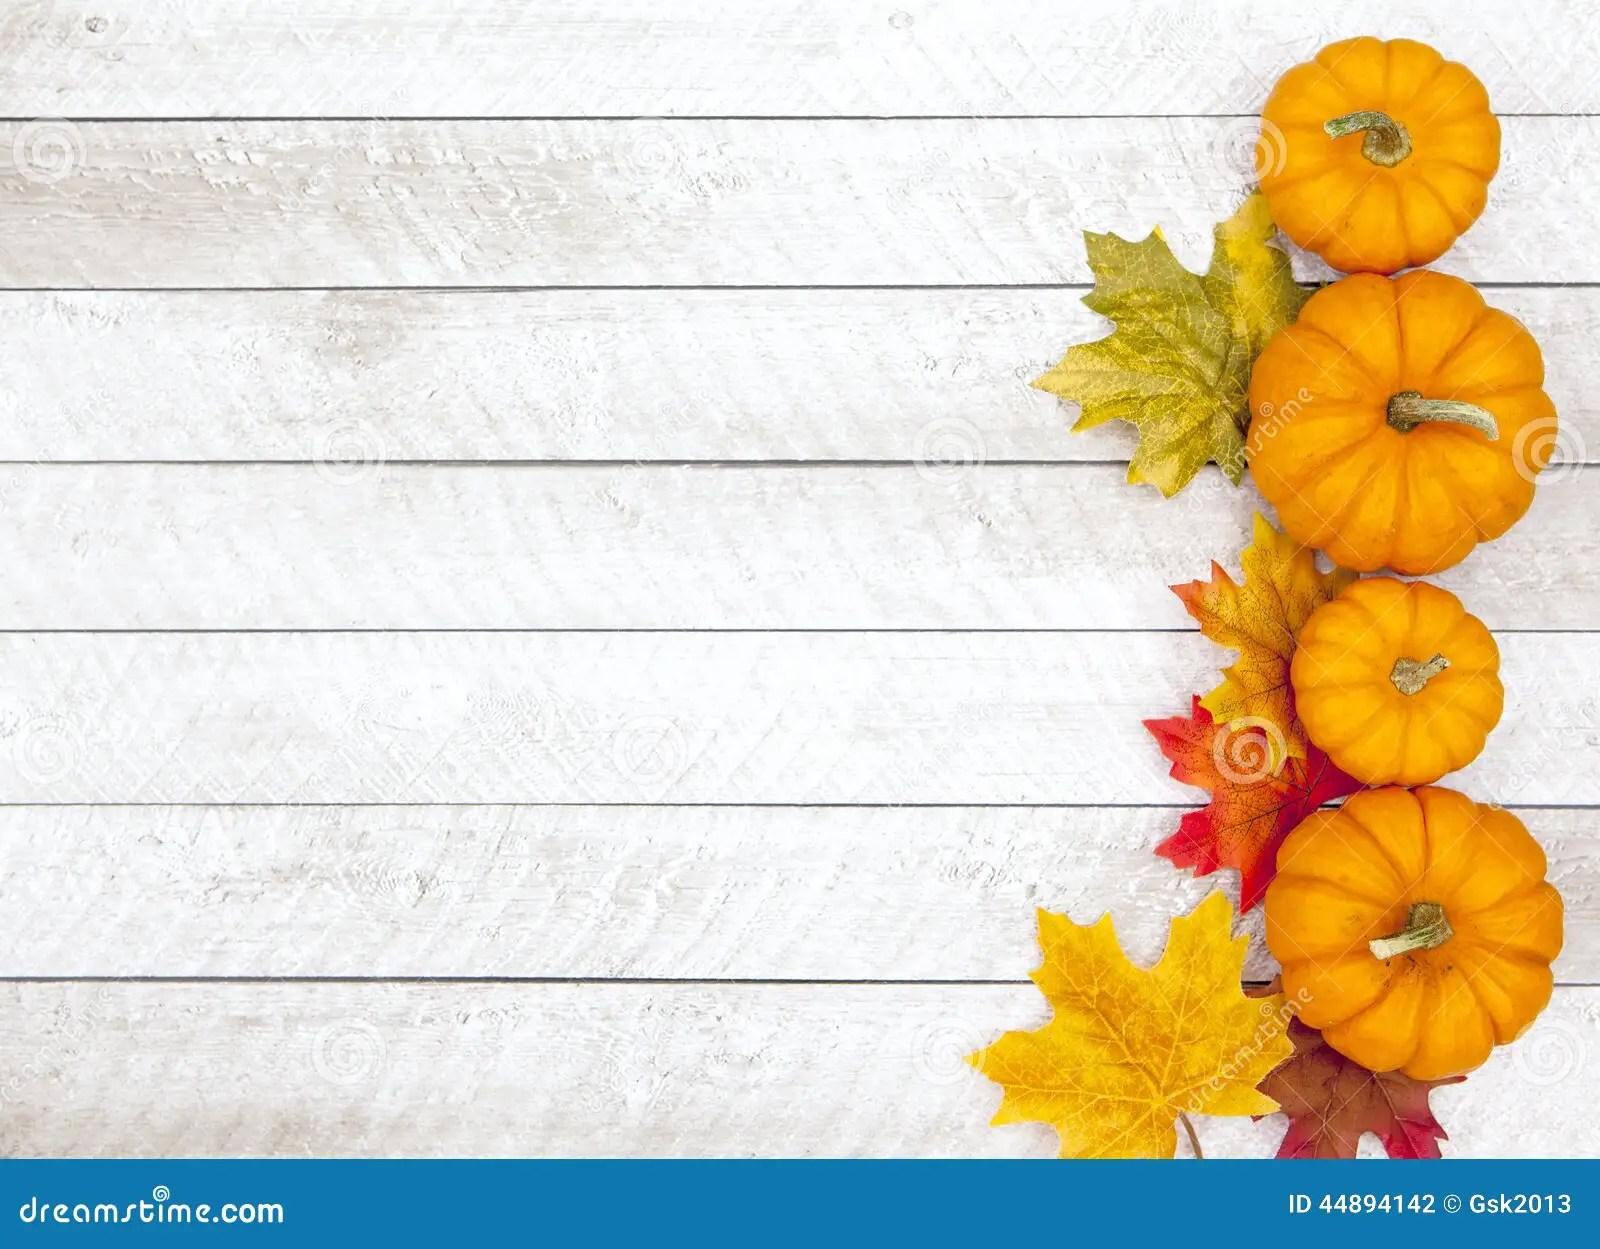 Fall Harvest Wallpaper Backgrounds Autumn Pumpkin Thanksgiving Background Stock Photo Image